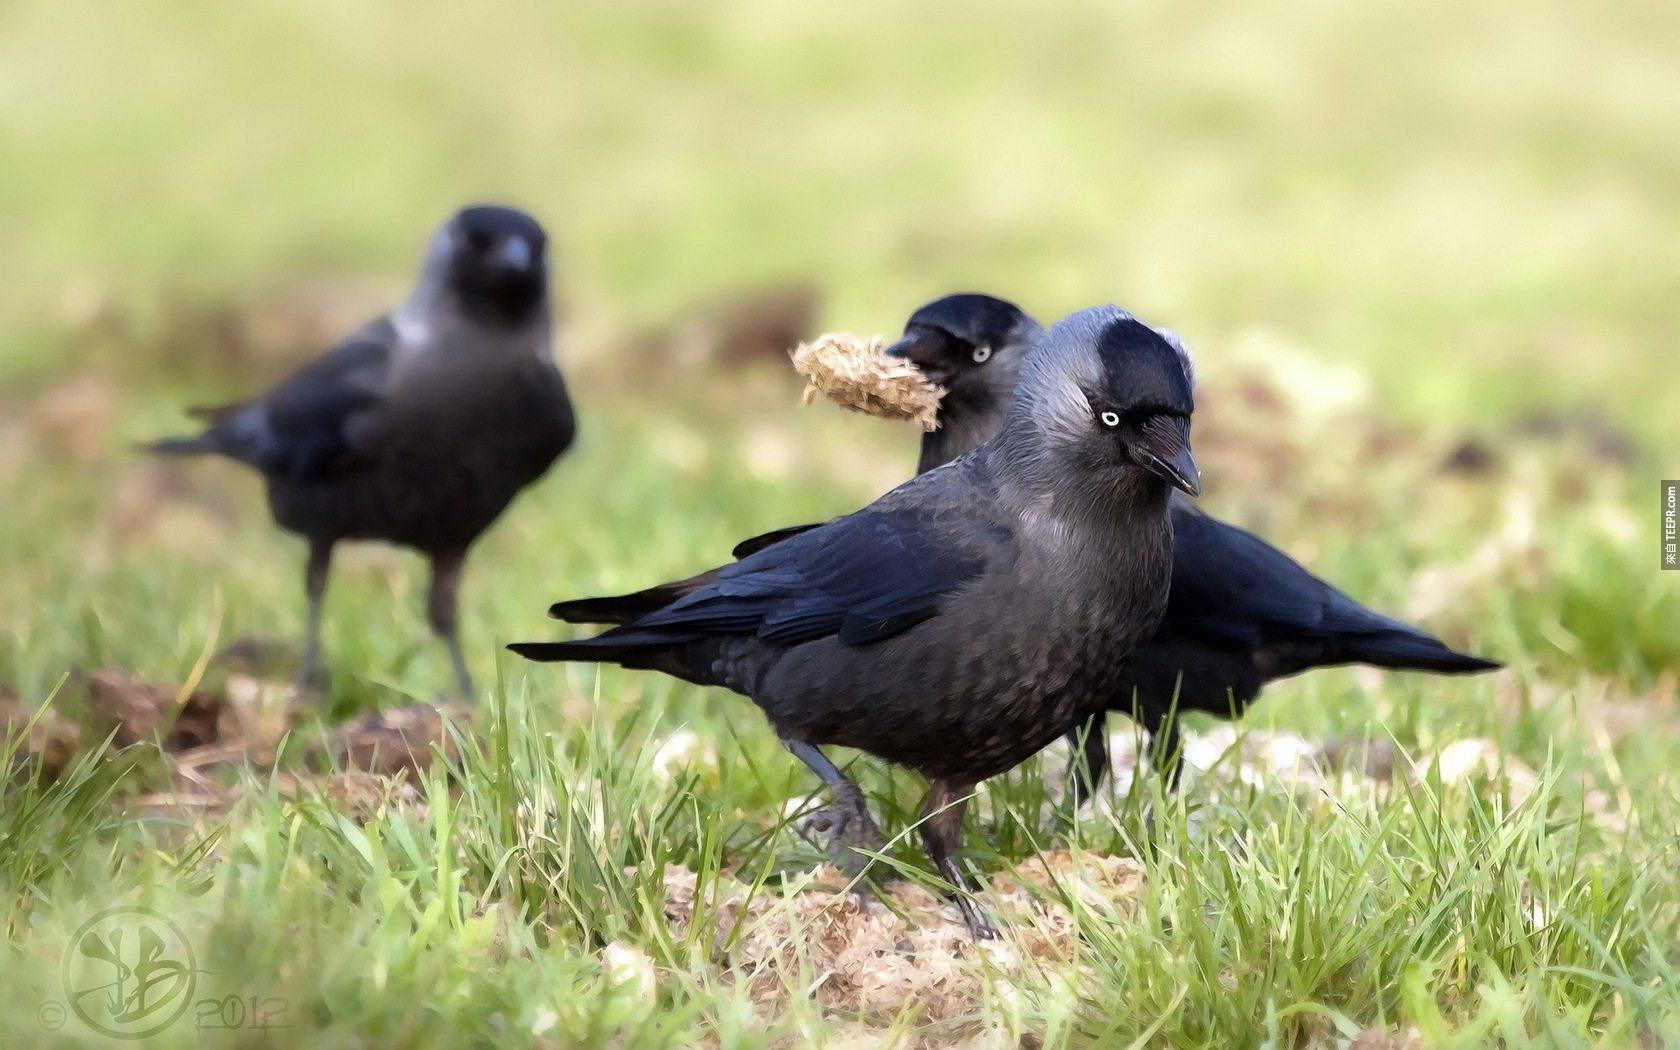 Cute-Crows-Wallpaper